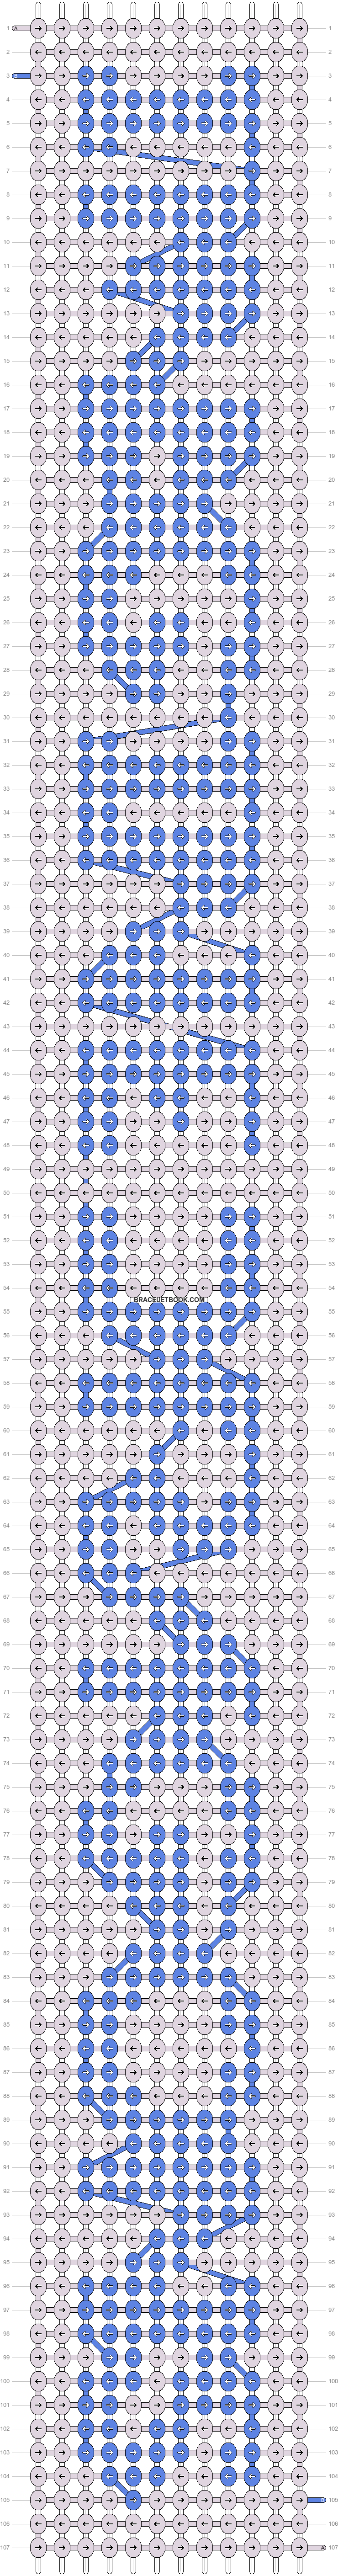 Alpha Pattern #13860 added by hollyb15